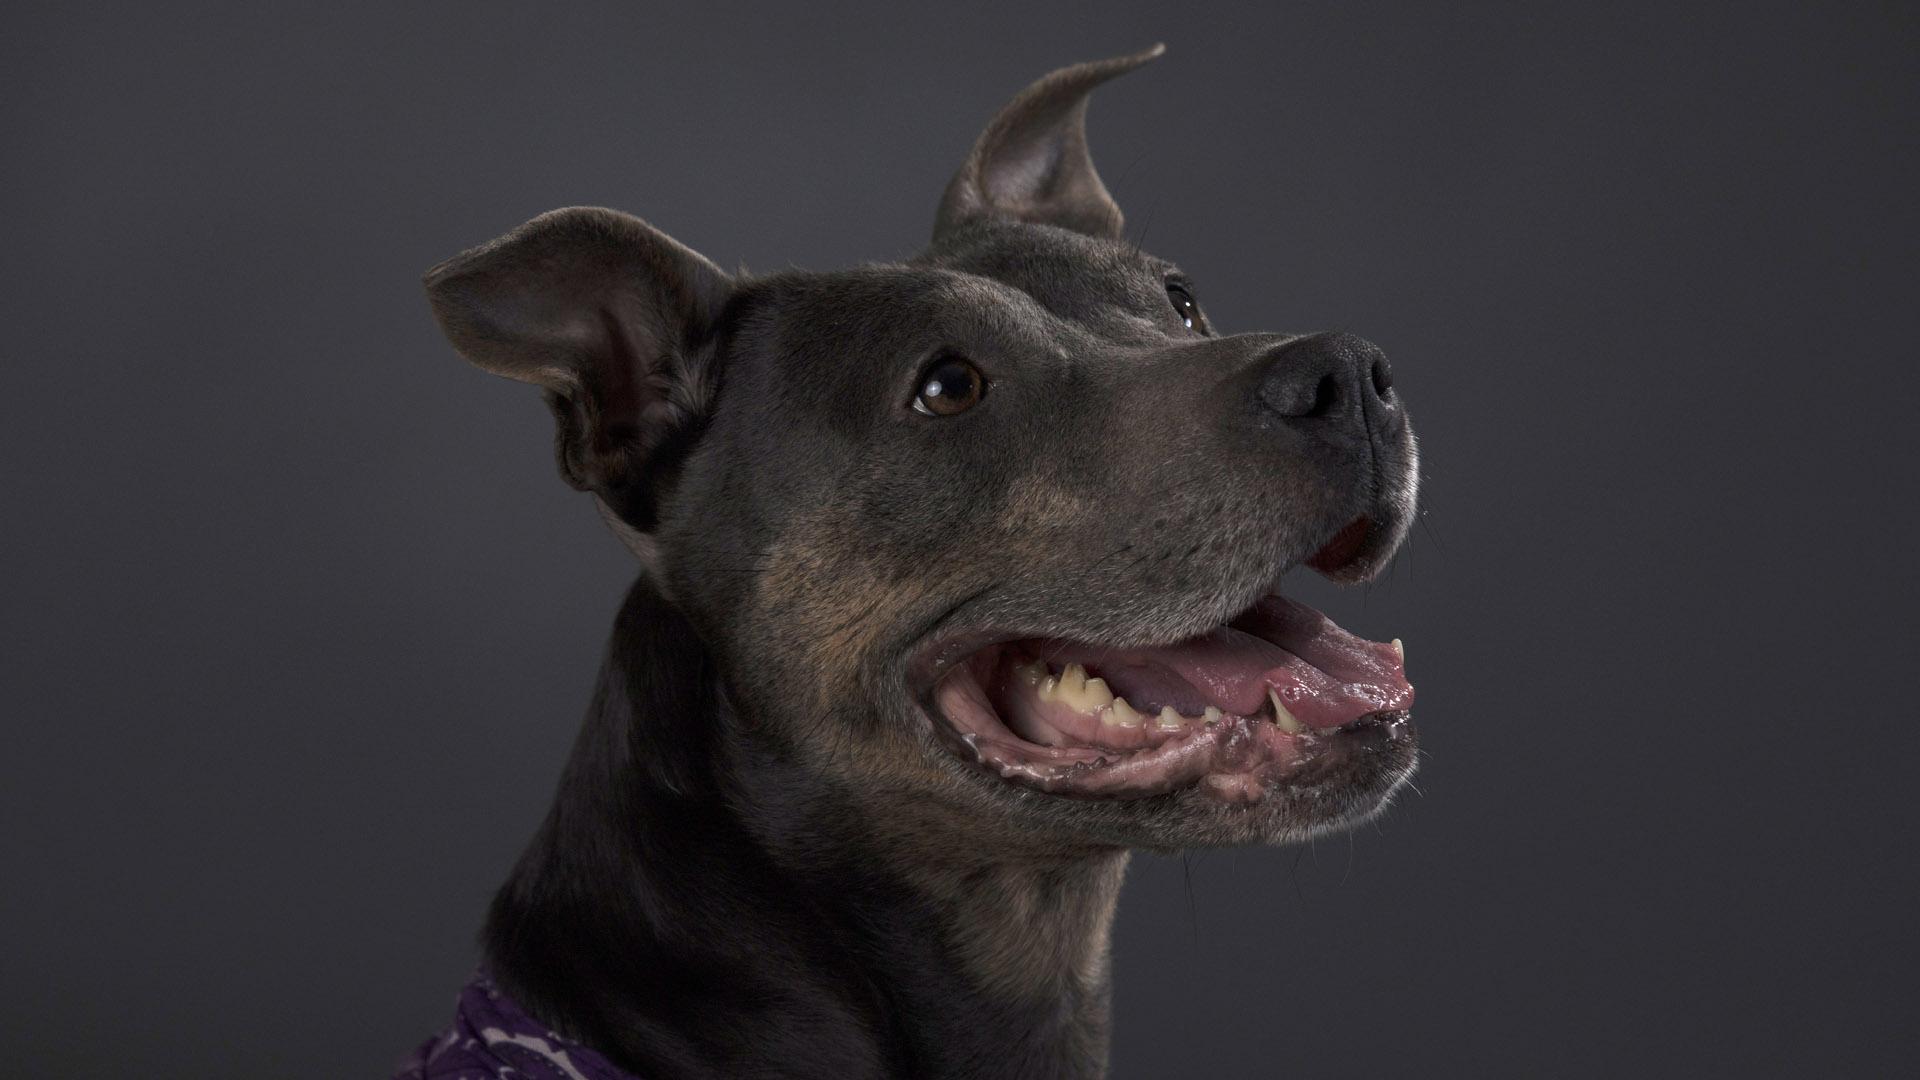 Staffordshire Bull Terrier, common name is pitbull, pit bull49504661-159532